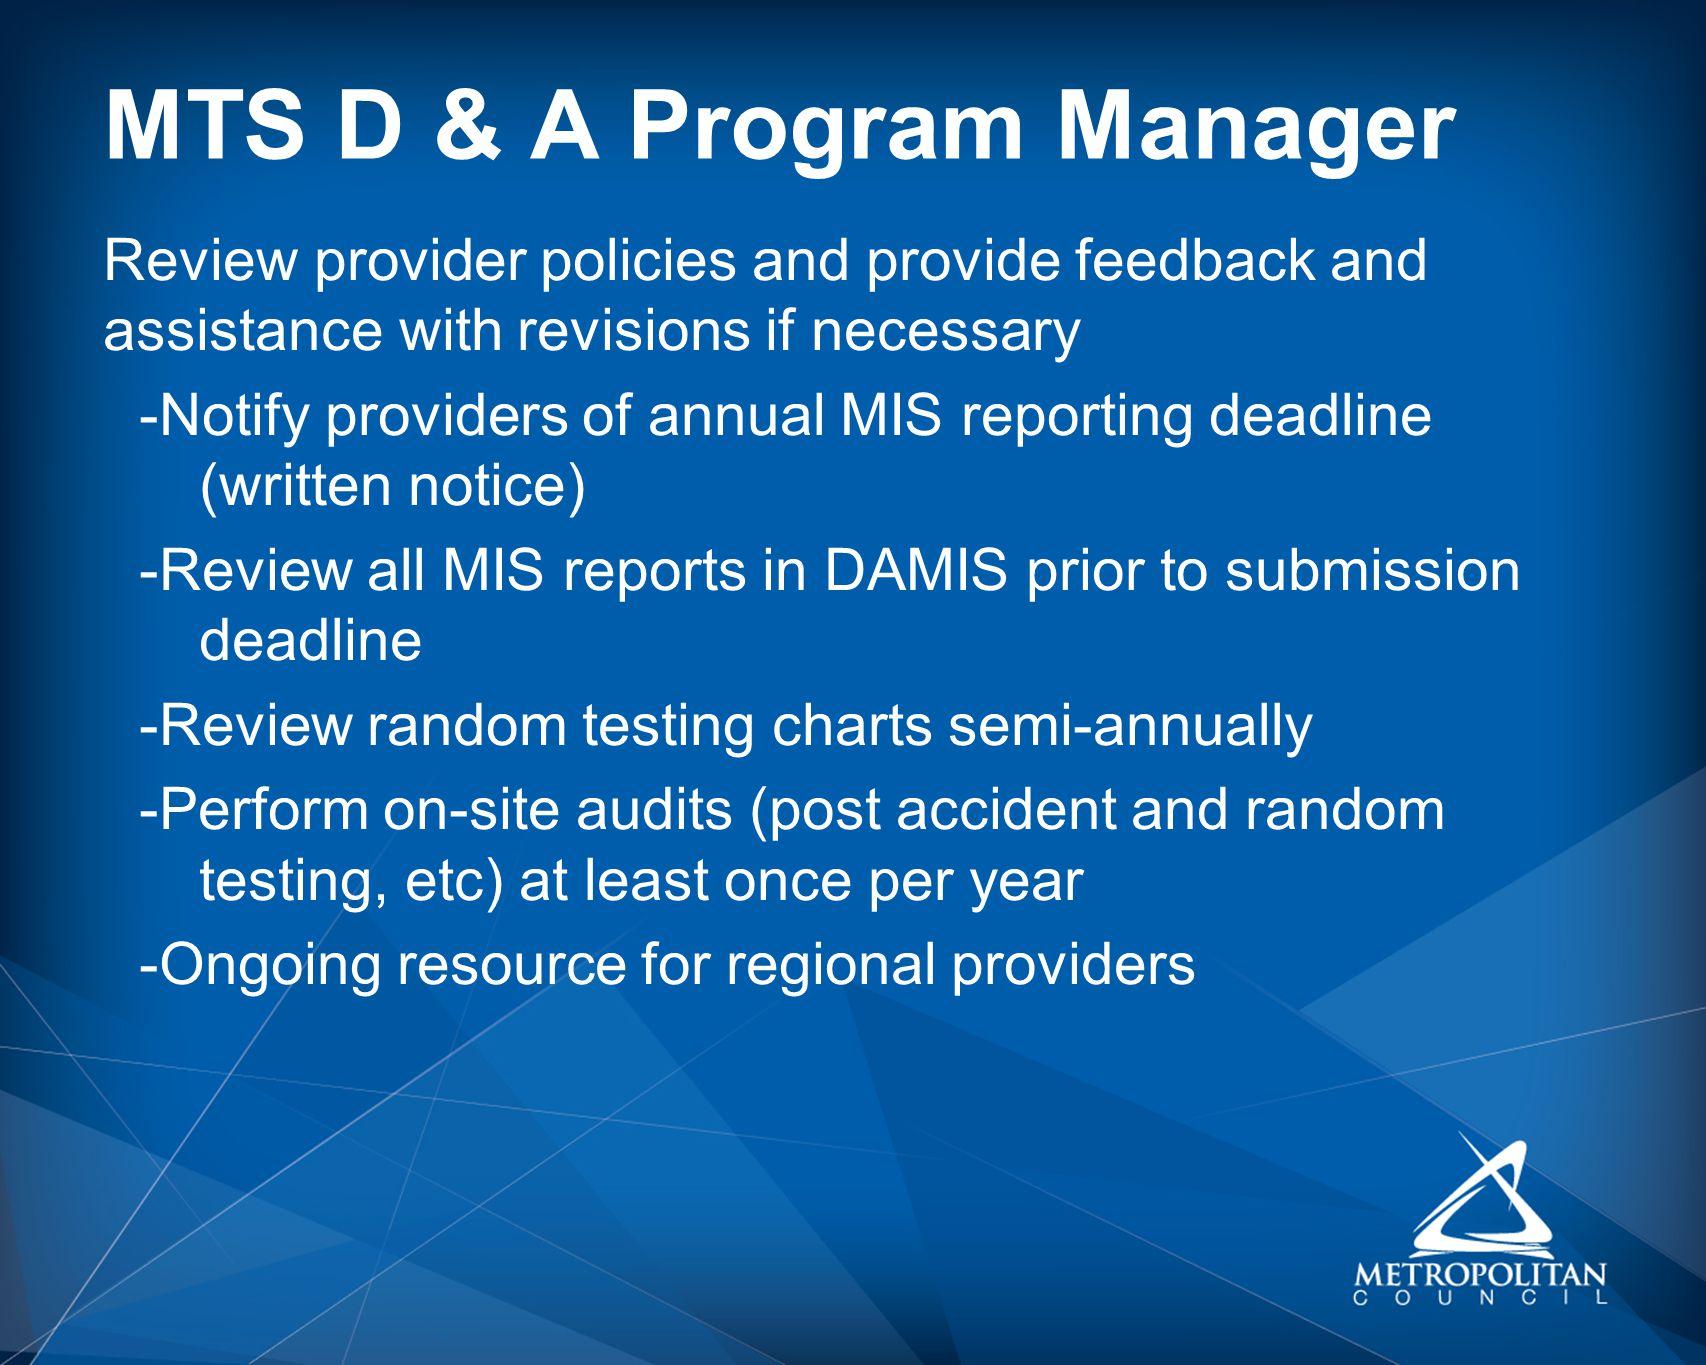 MTS D & A Program Manager